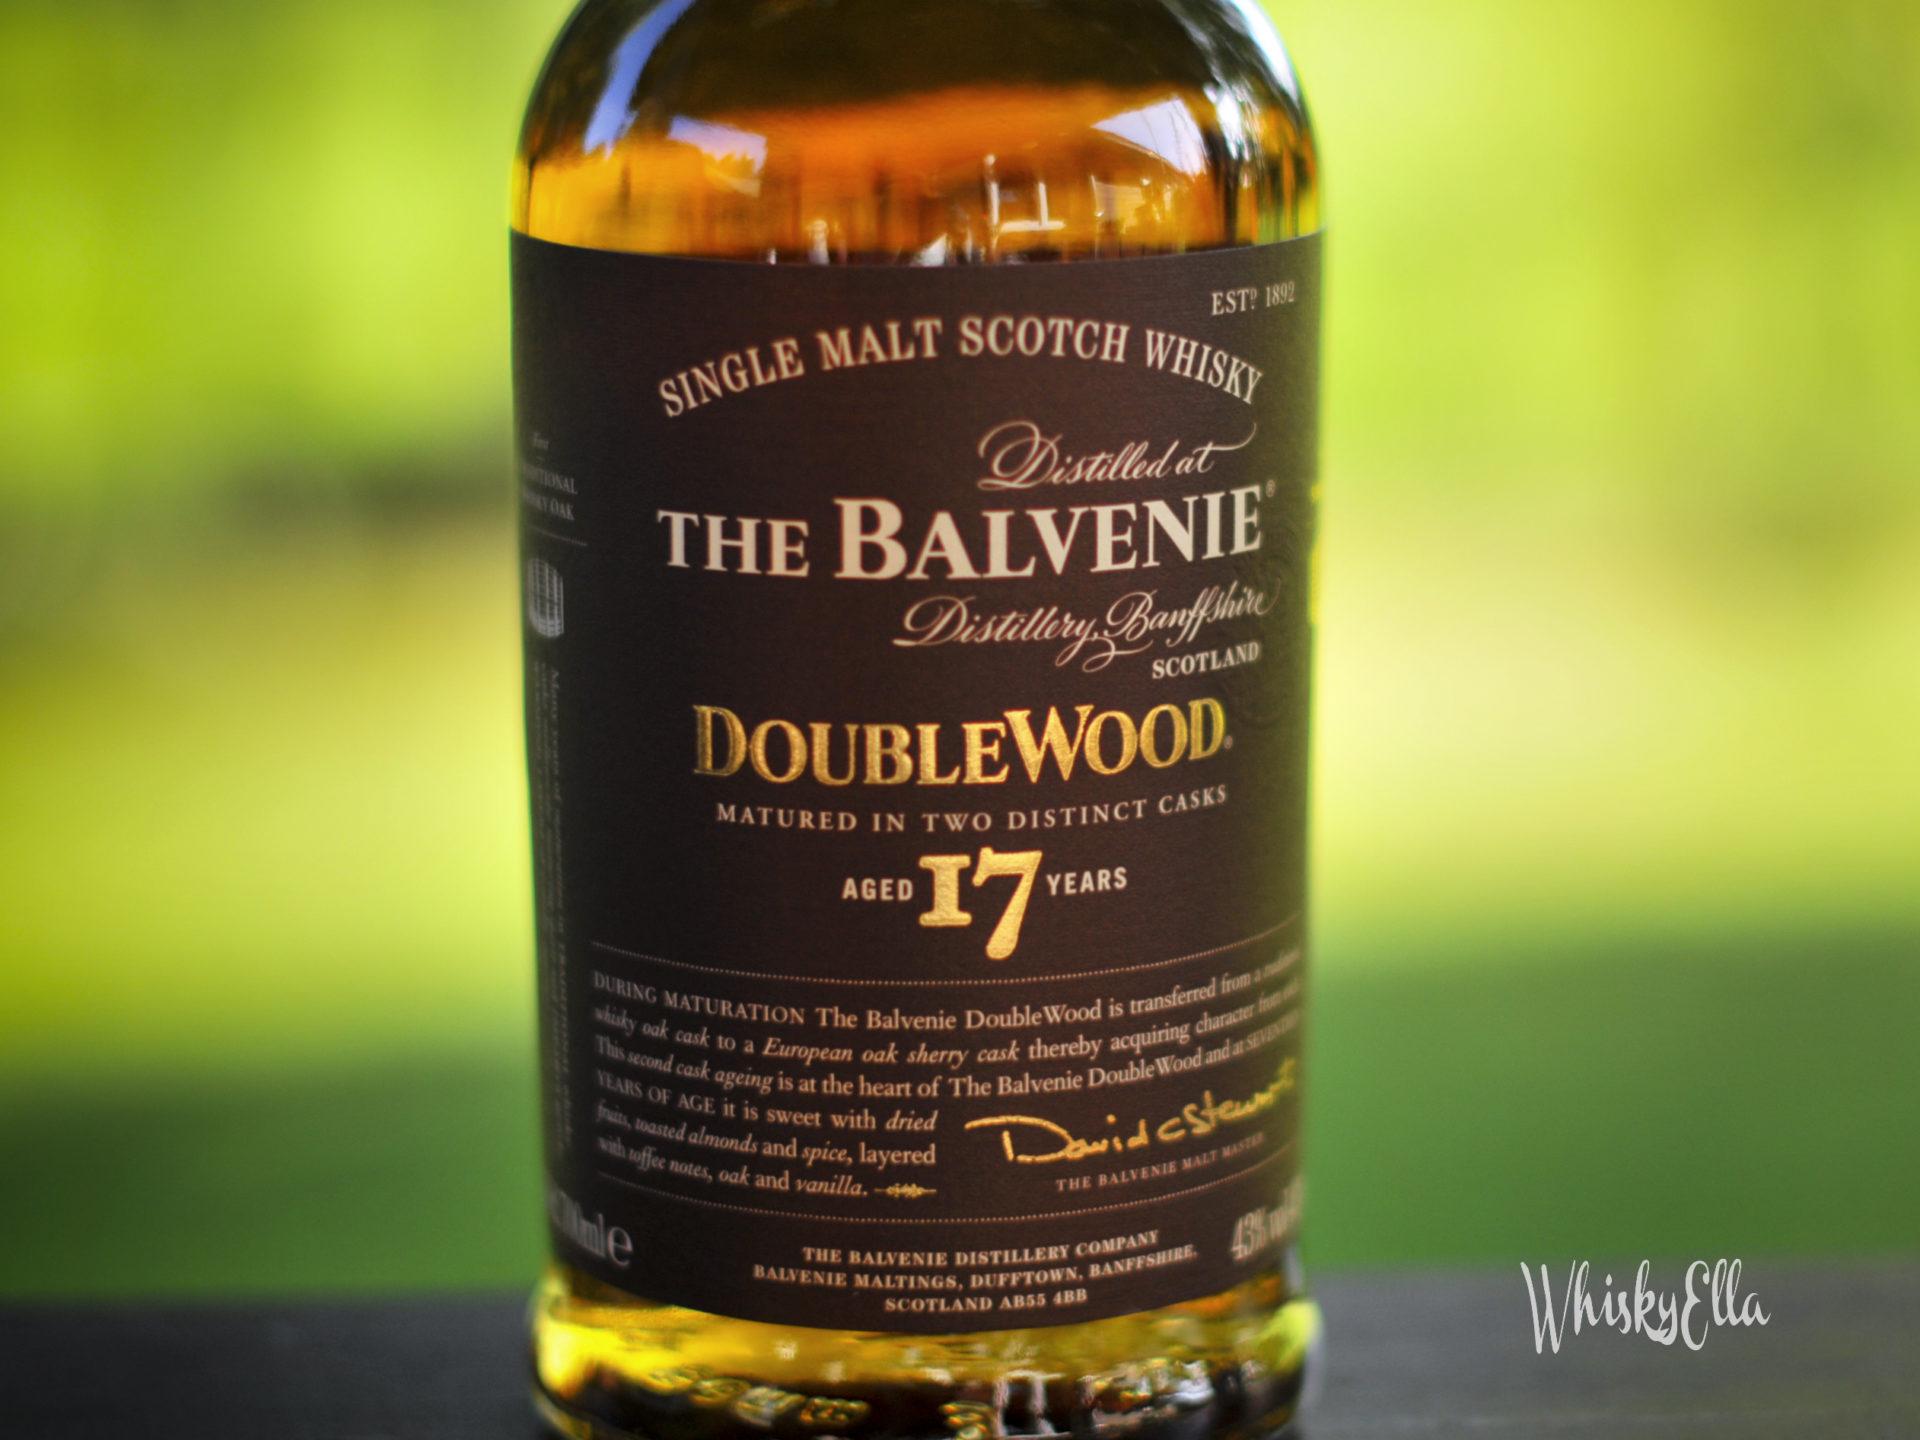 Nasza recenzja Balvenie 17 yo Double Wood 17 yo #37